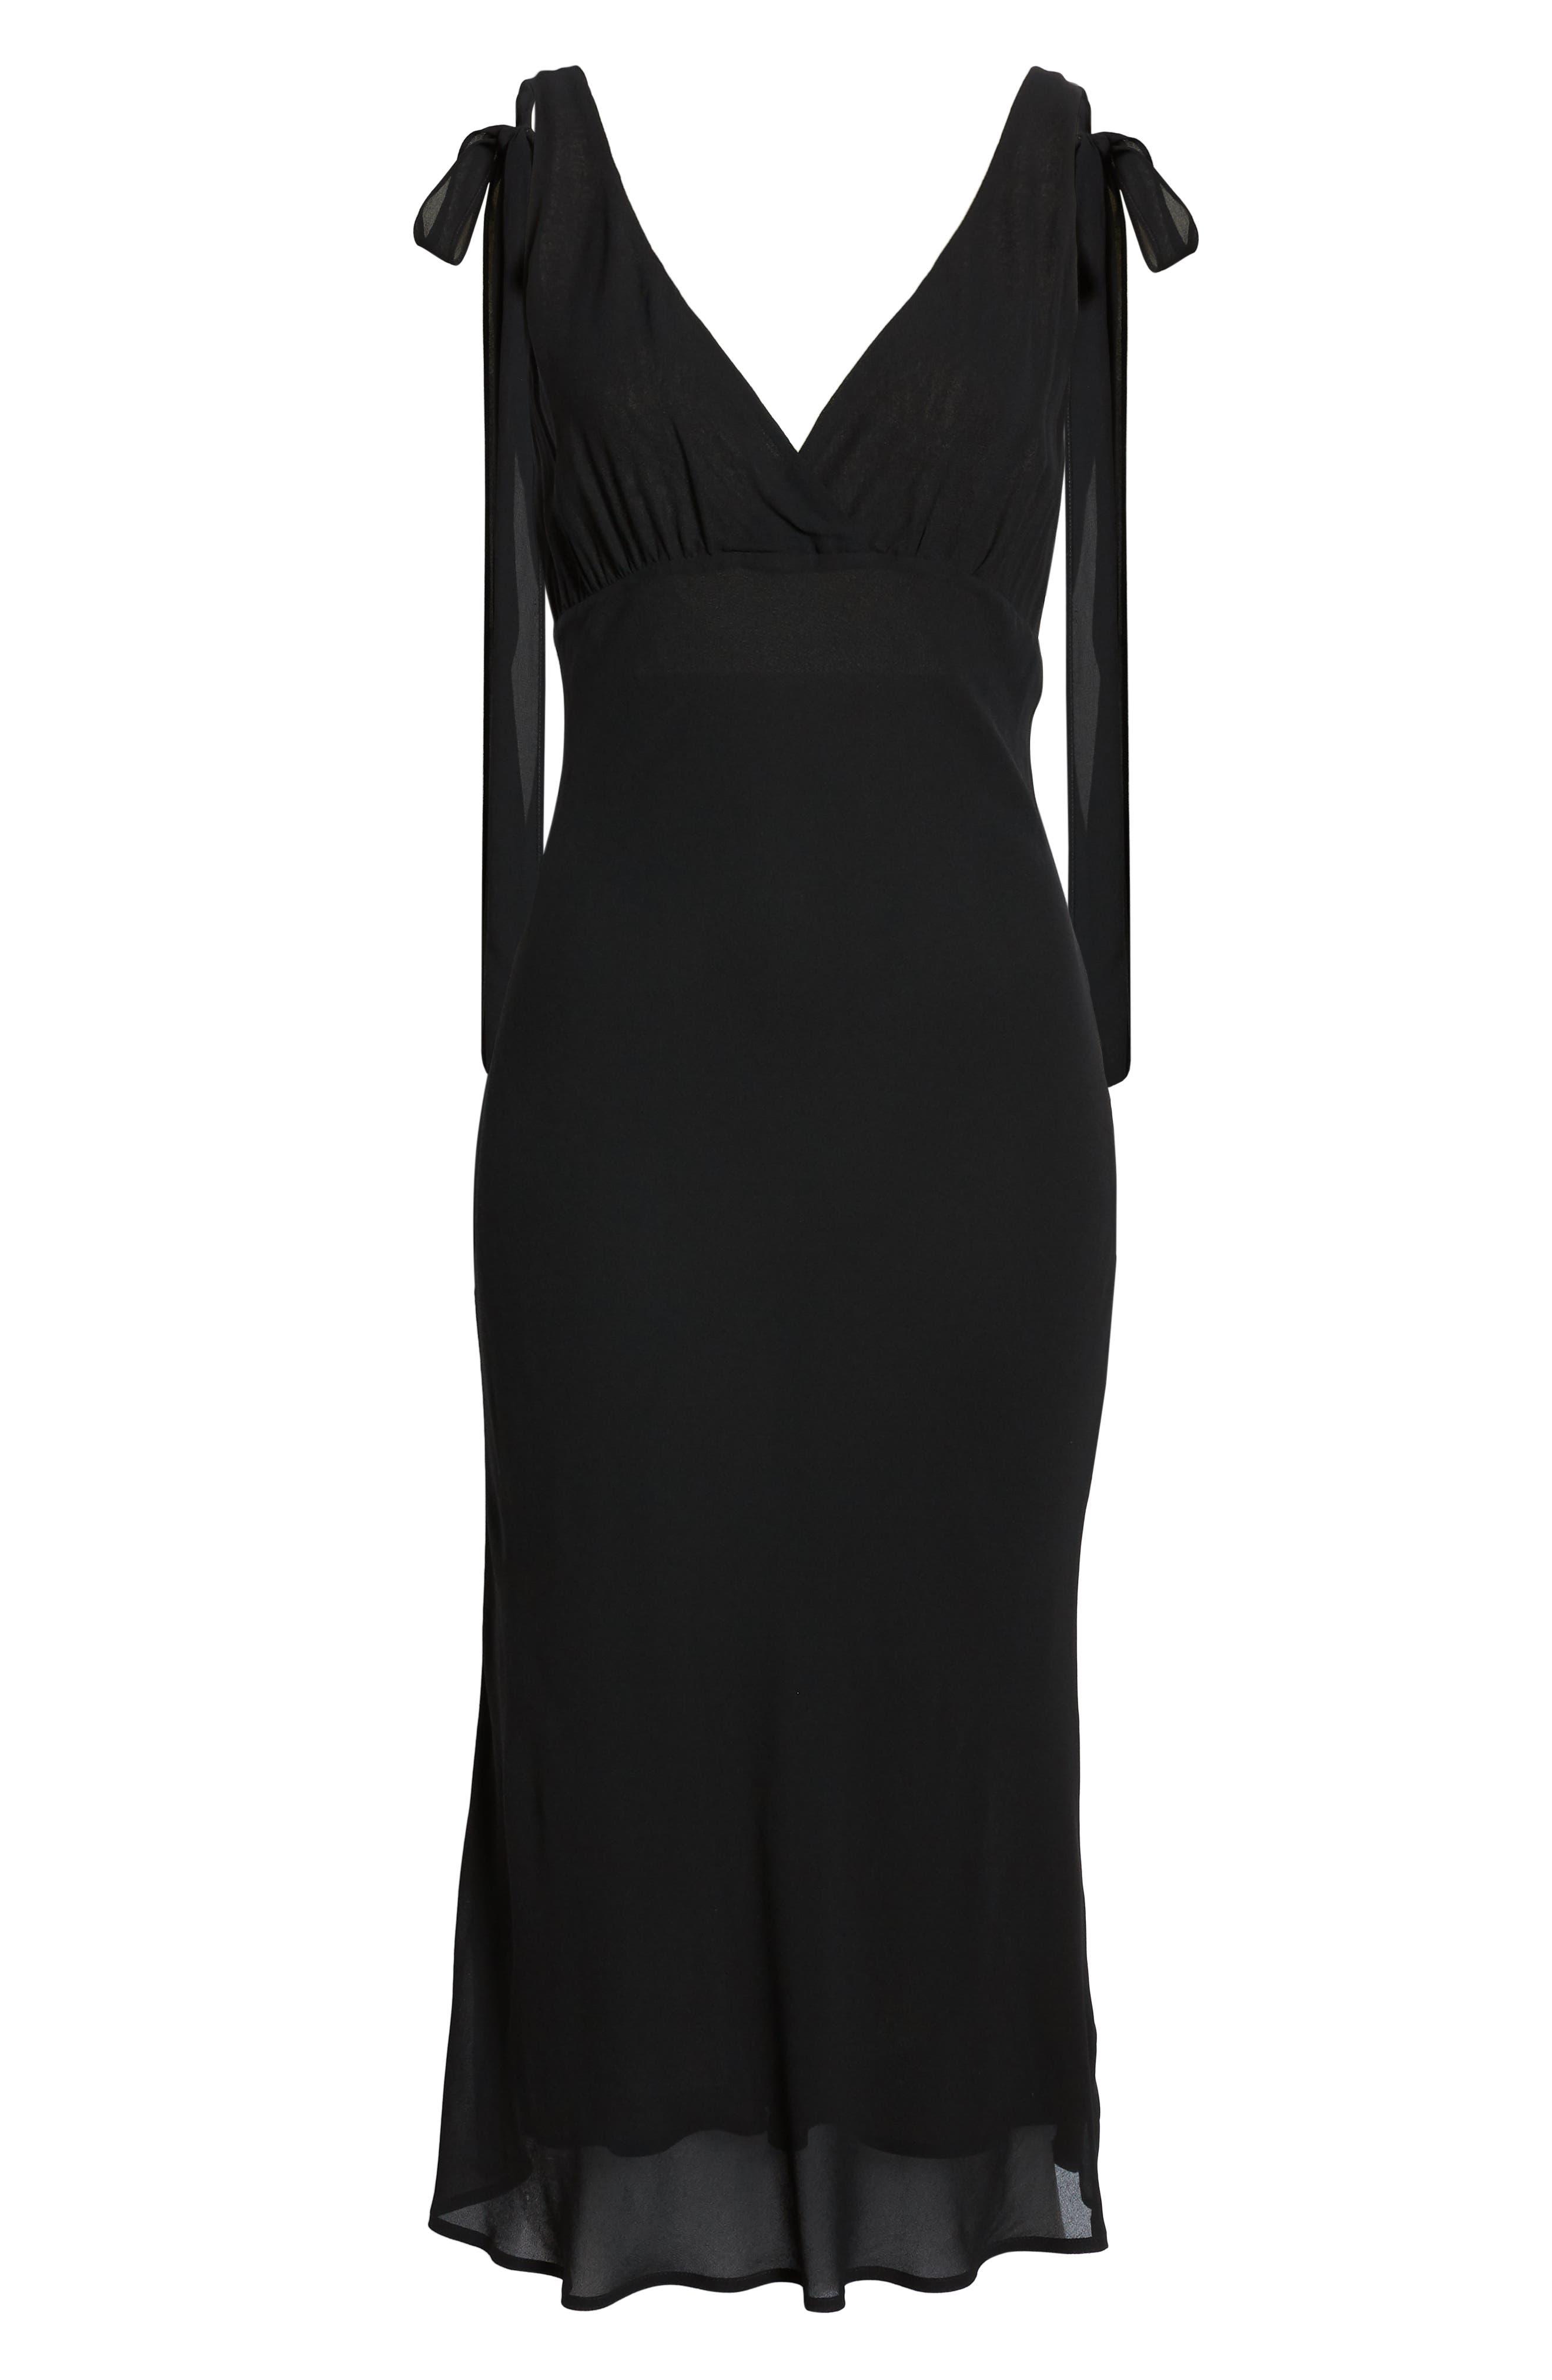 REFORMATION, Venezia Dress, Alternate thumbnail 7, color, BLACK